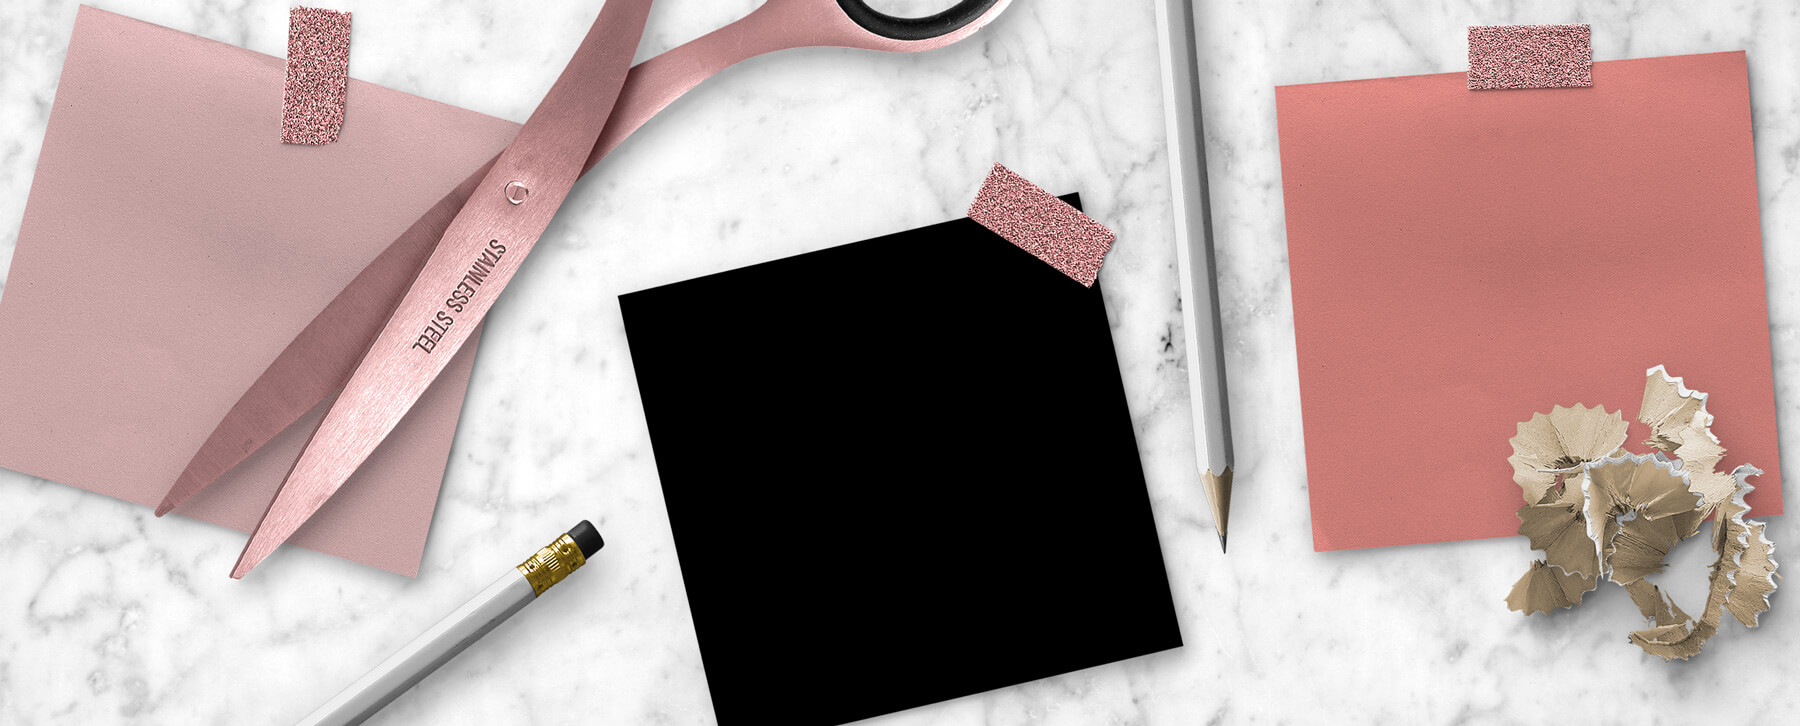 Blush Pink, Rose Gold, Black moodboard